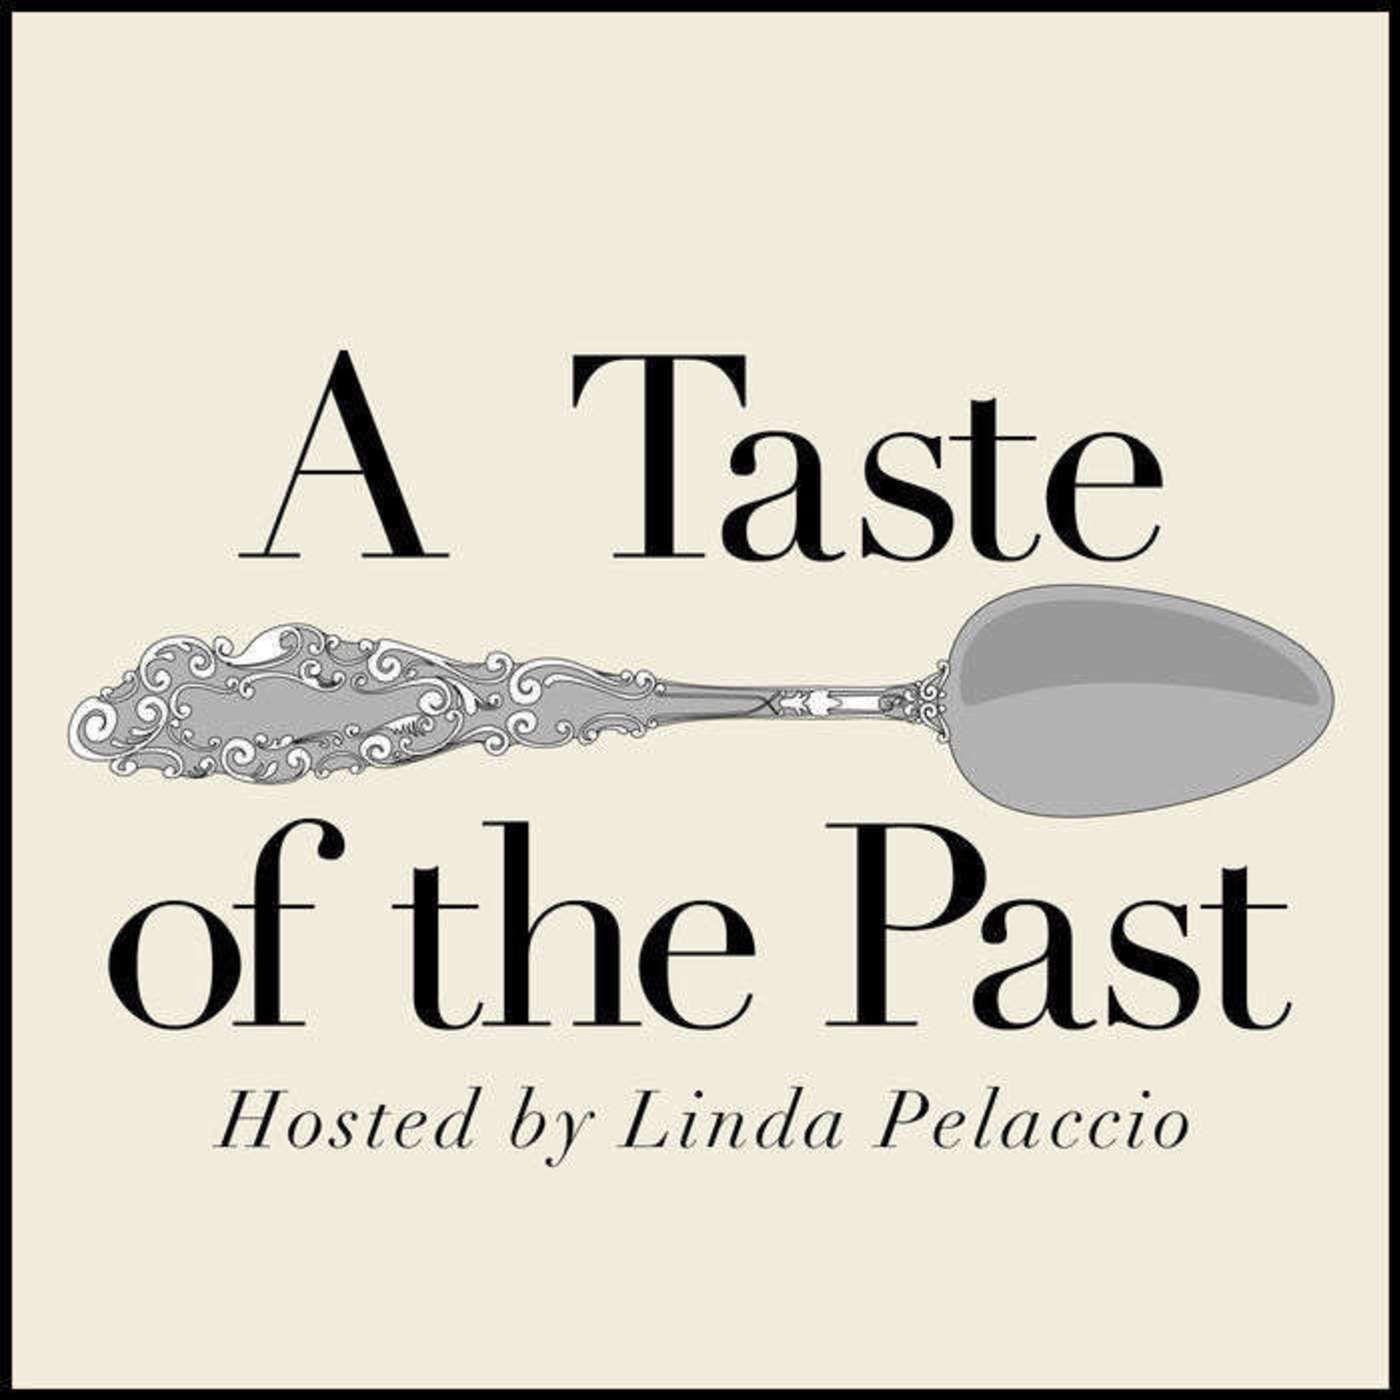 Episode 10: Peter Kaminsky & Donna Gelb